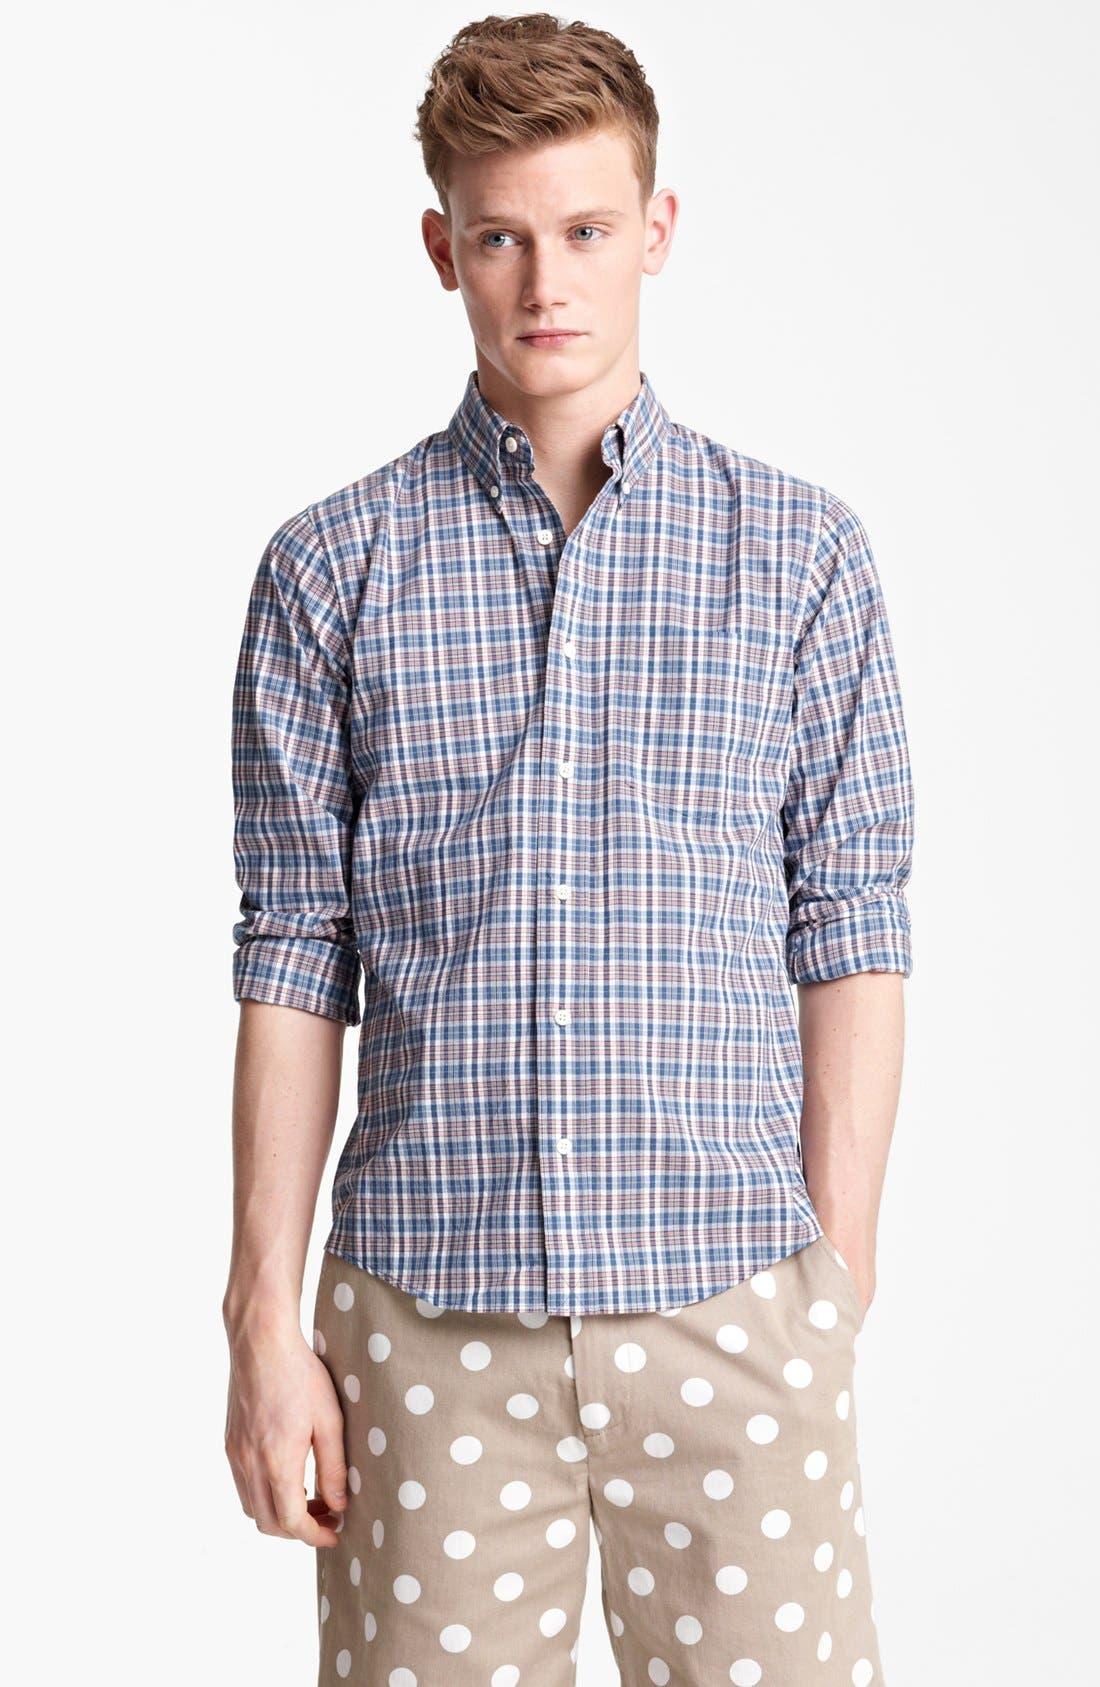 Main Image - Jack Spade 'Serge' Plaid Sport Shirt